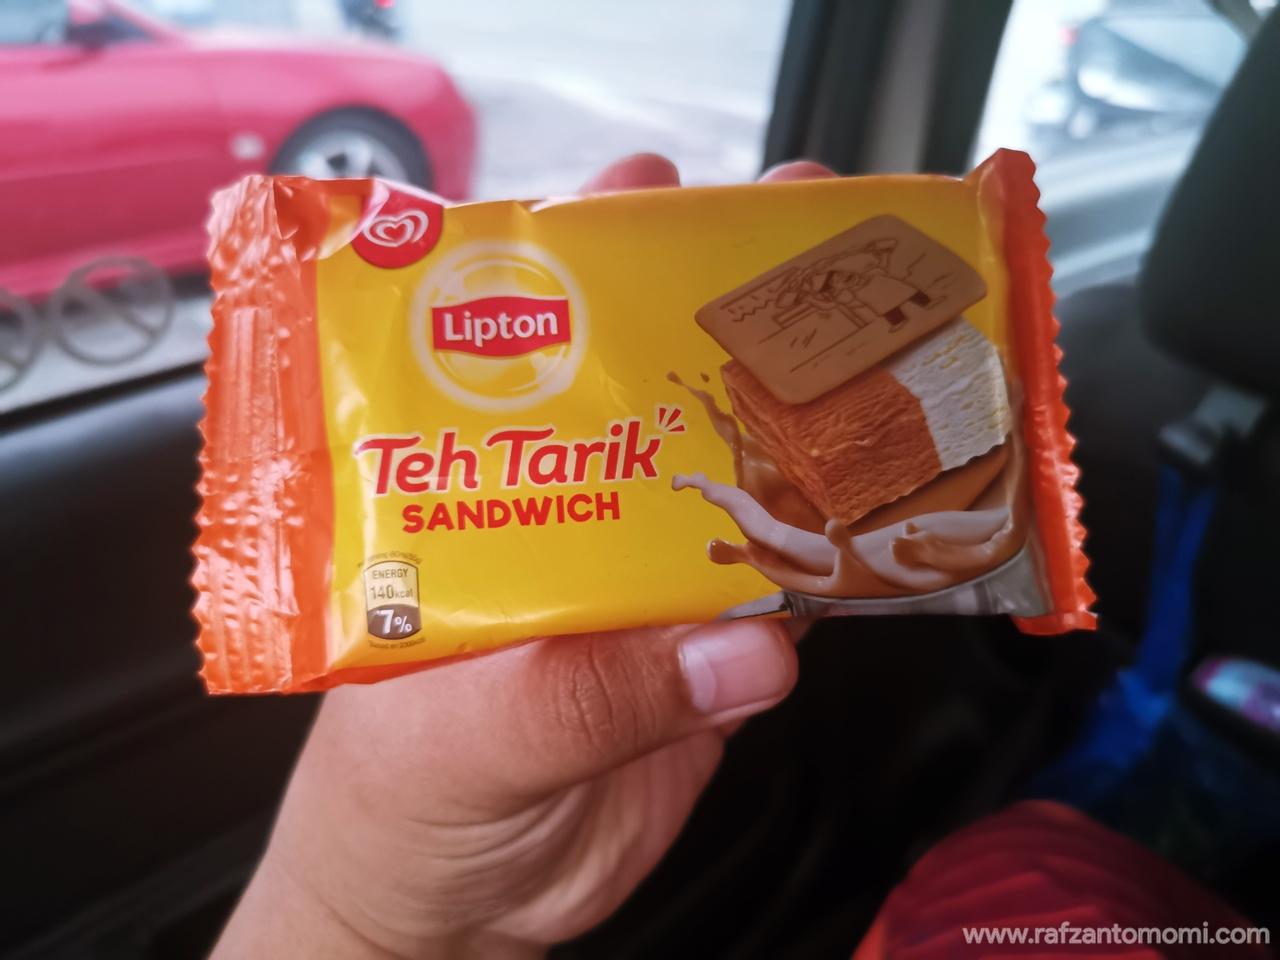 Cuba Walls x Lipton Teh Tarik Sandwich